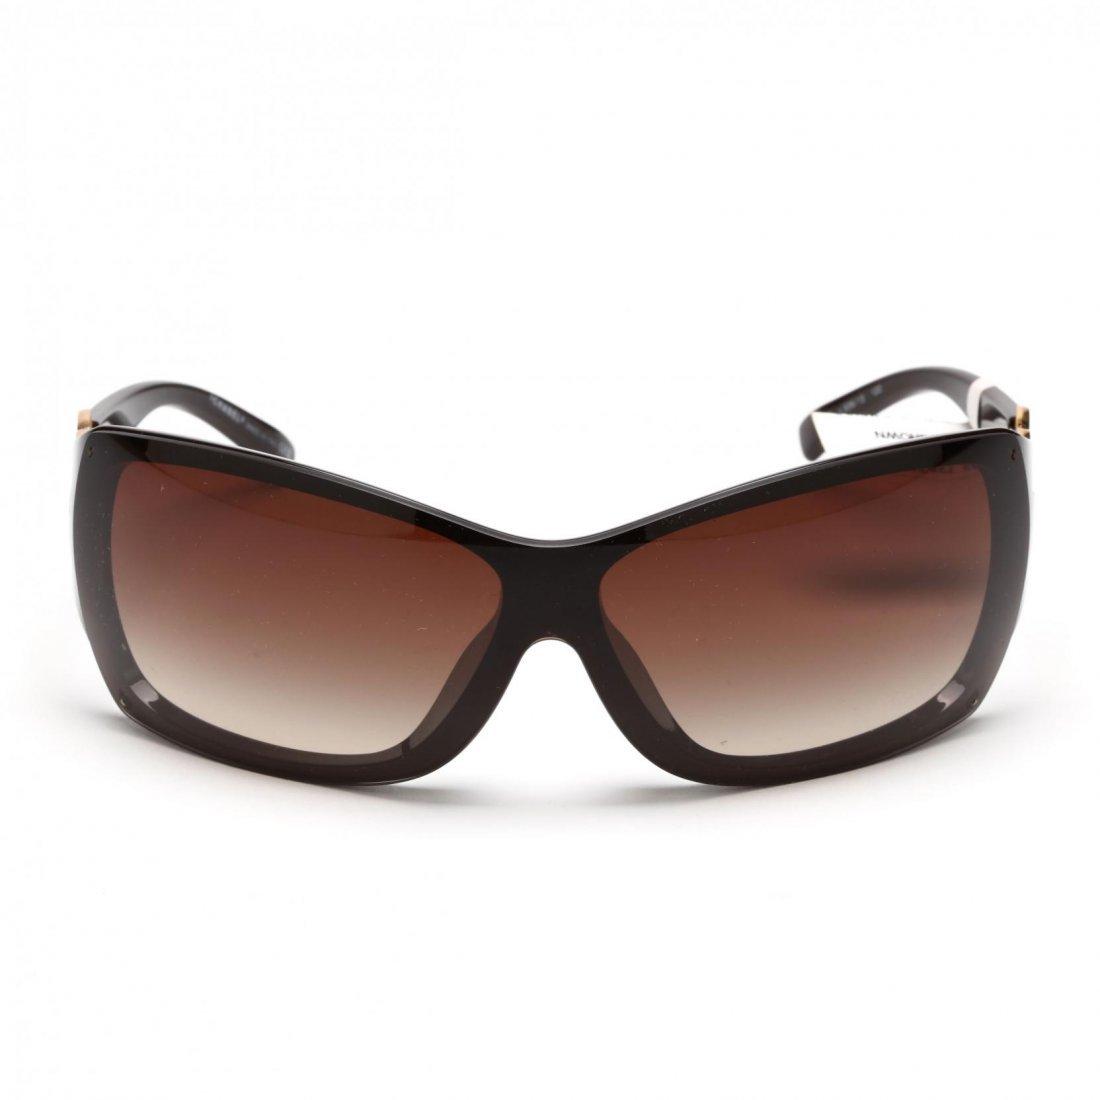 Logo Sunglasses, Chanel - 2